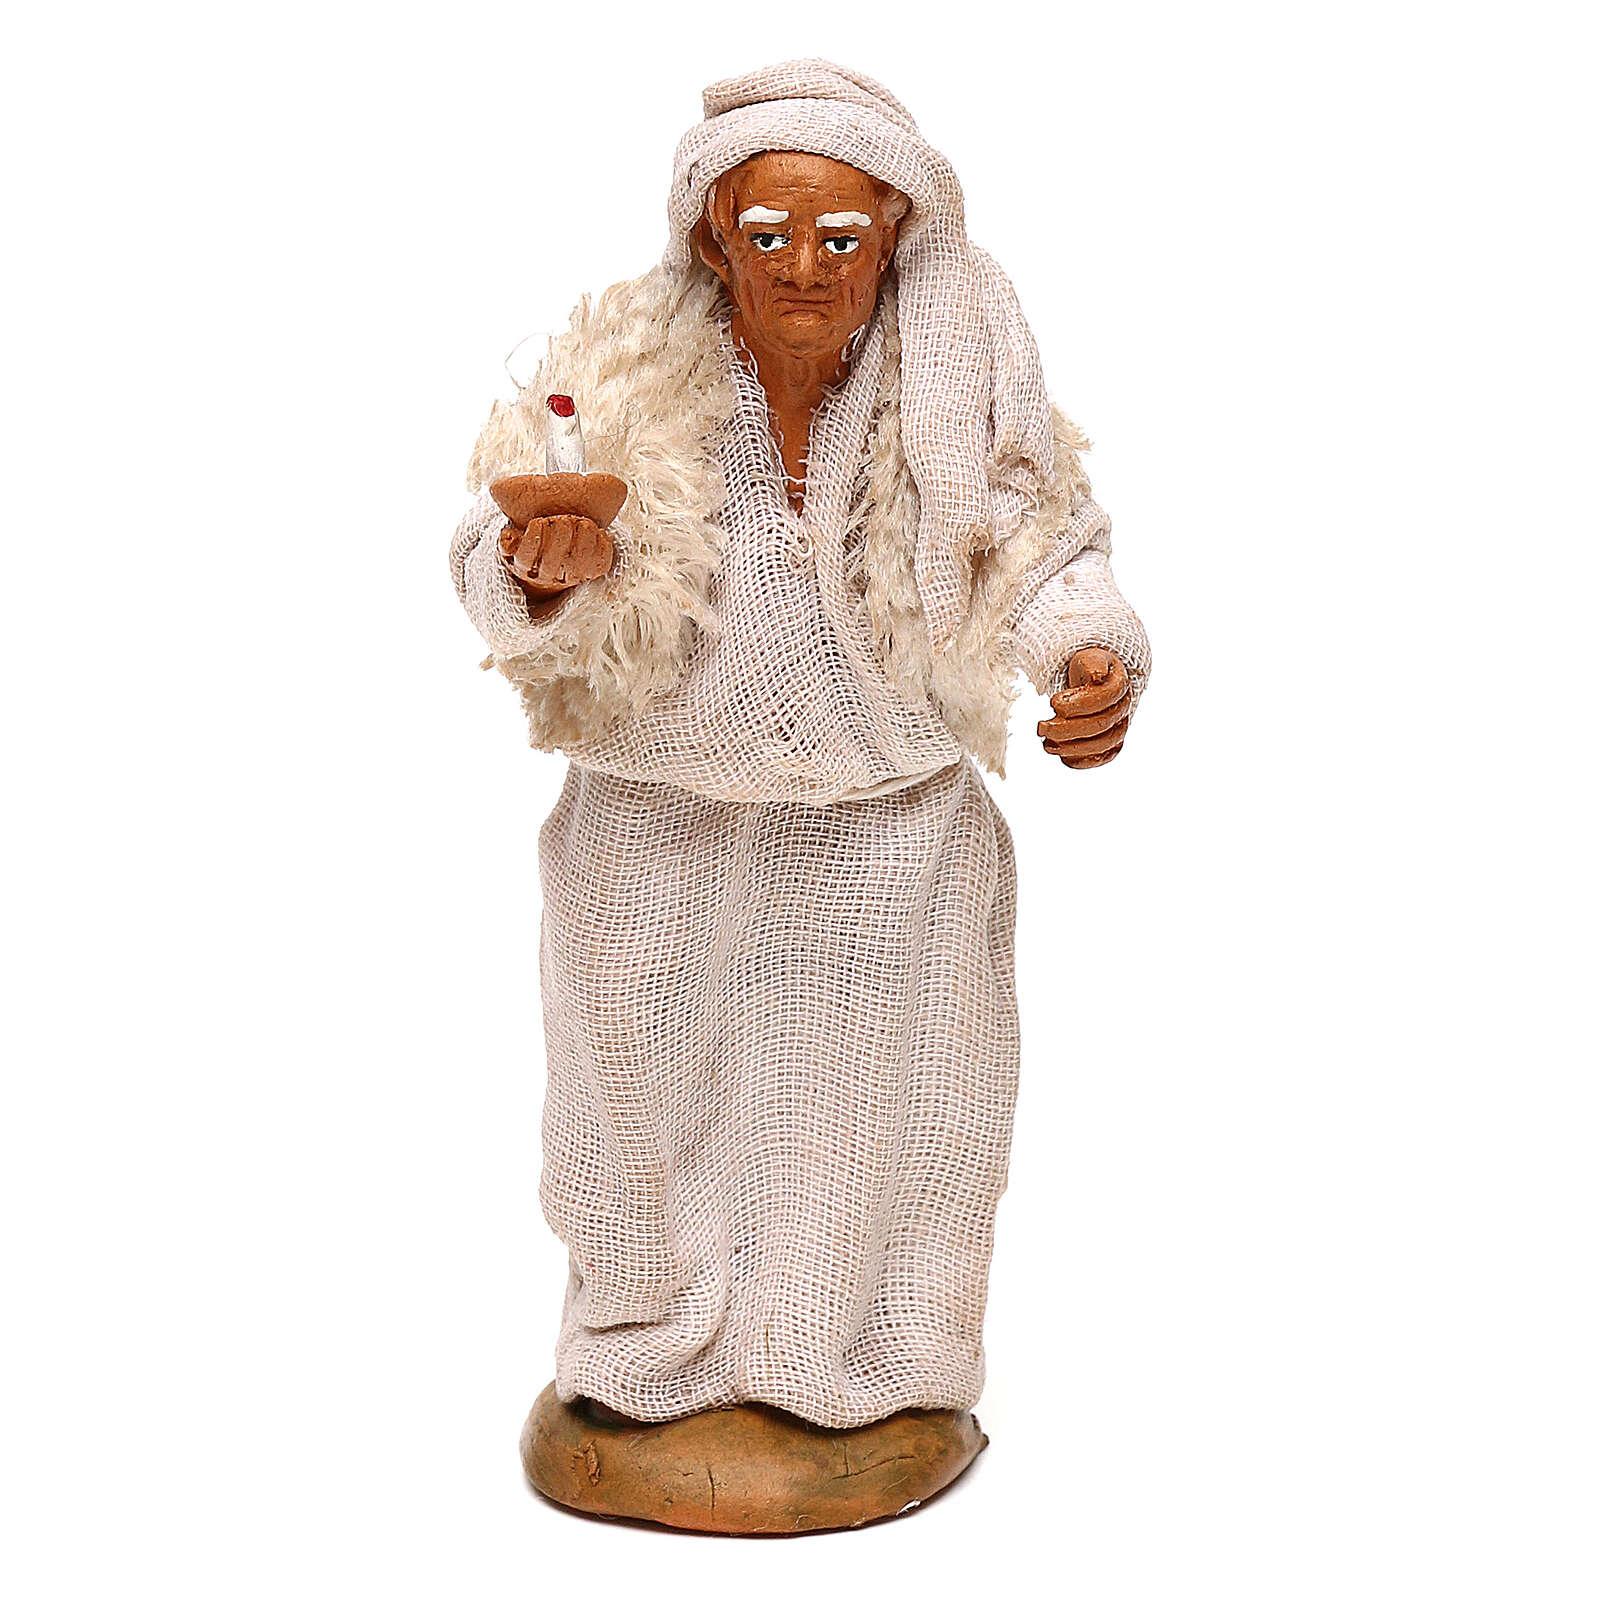 Viejo con vela belén napolitano 10 cm 4